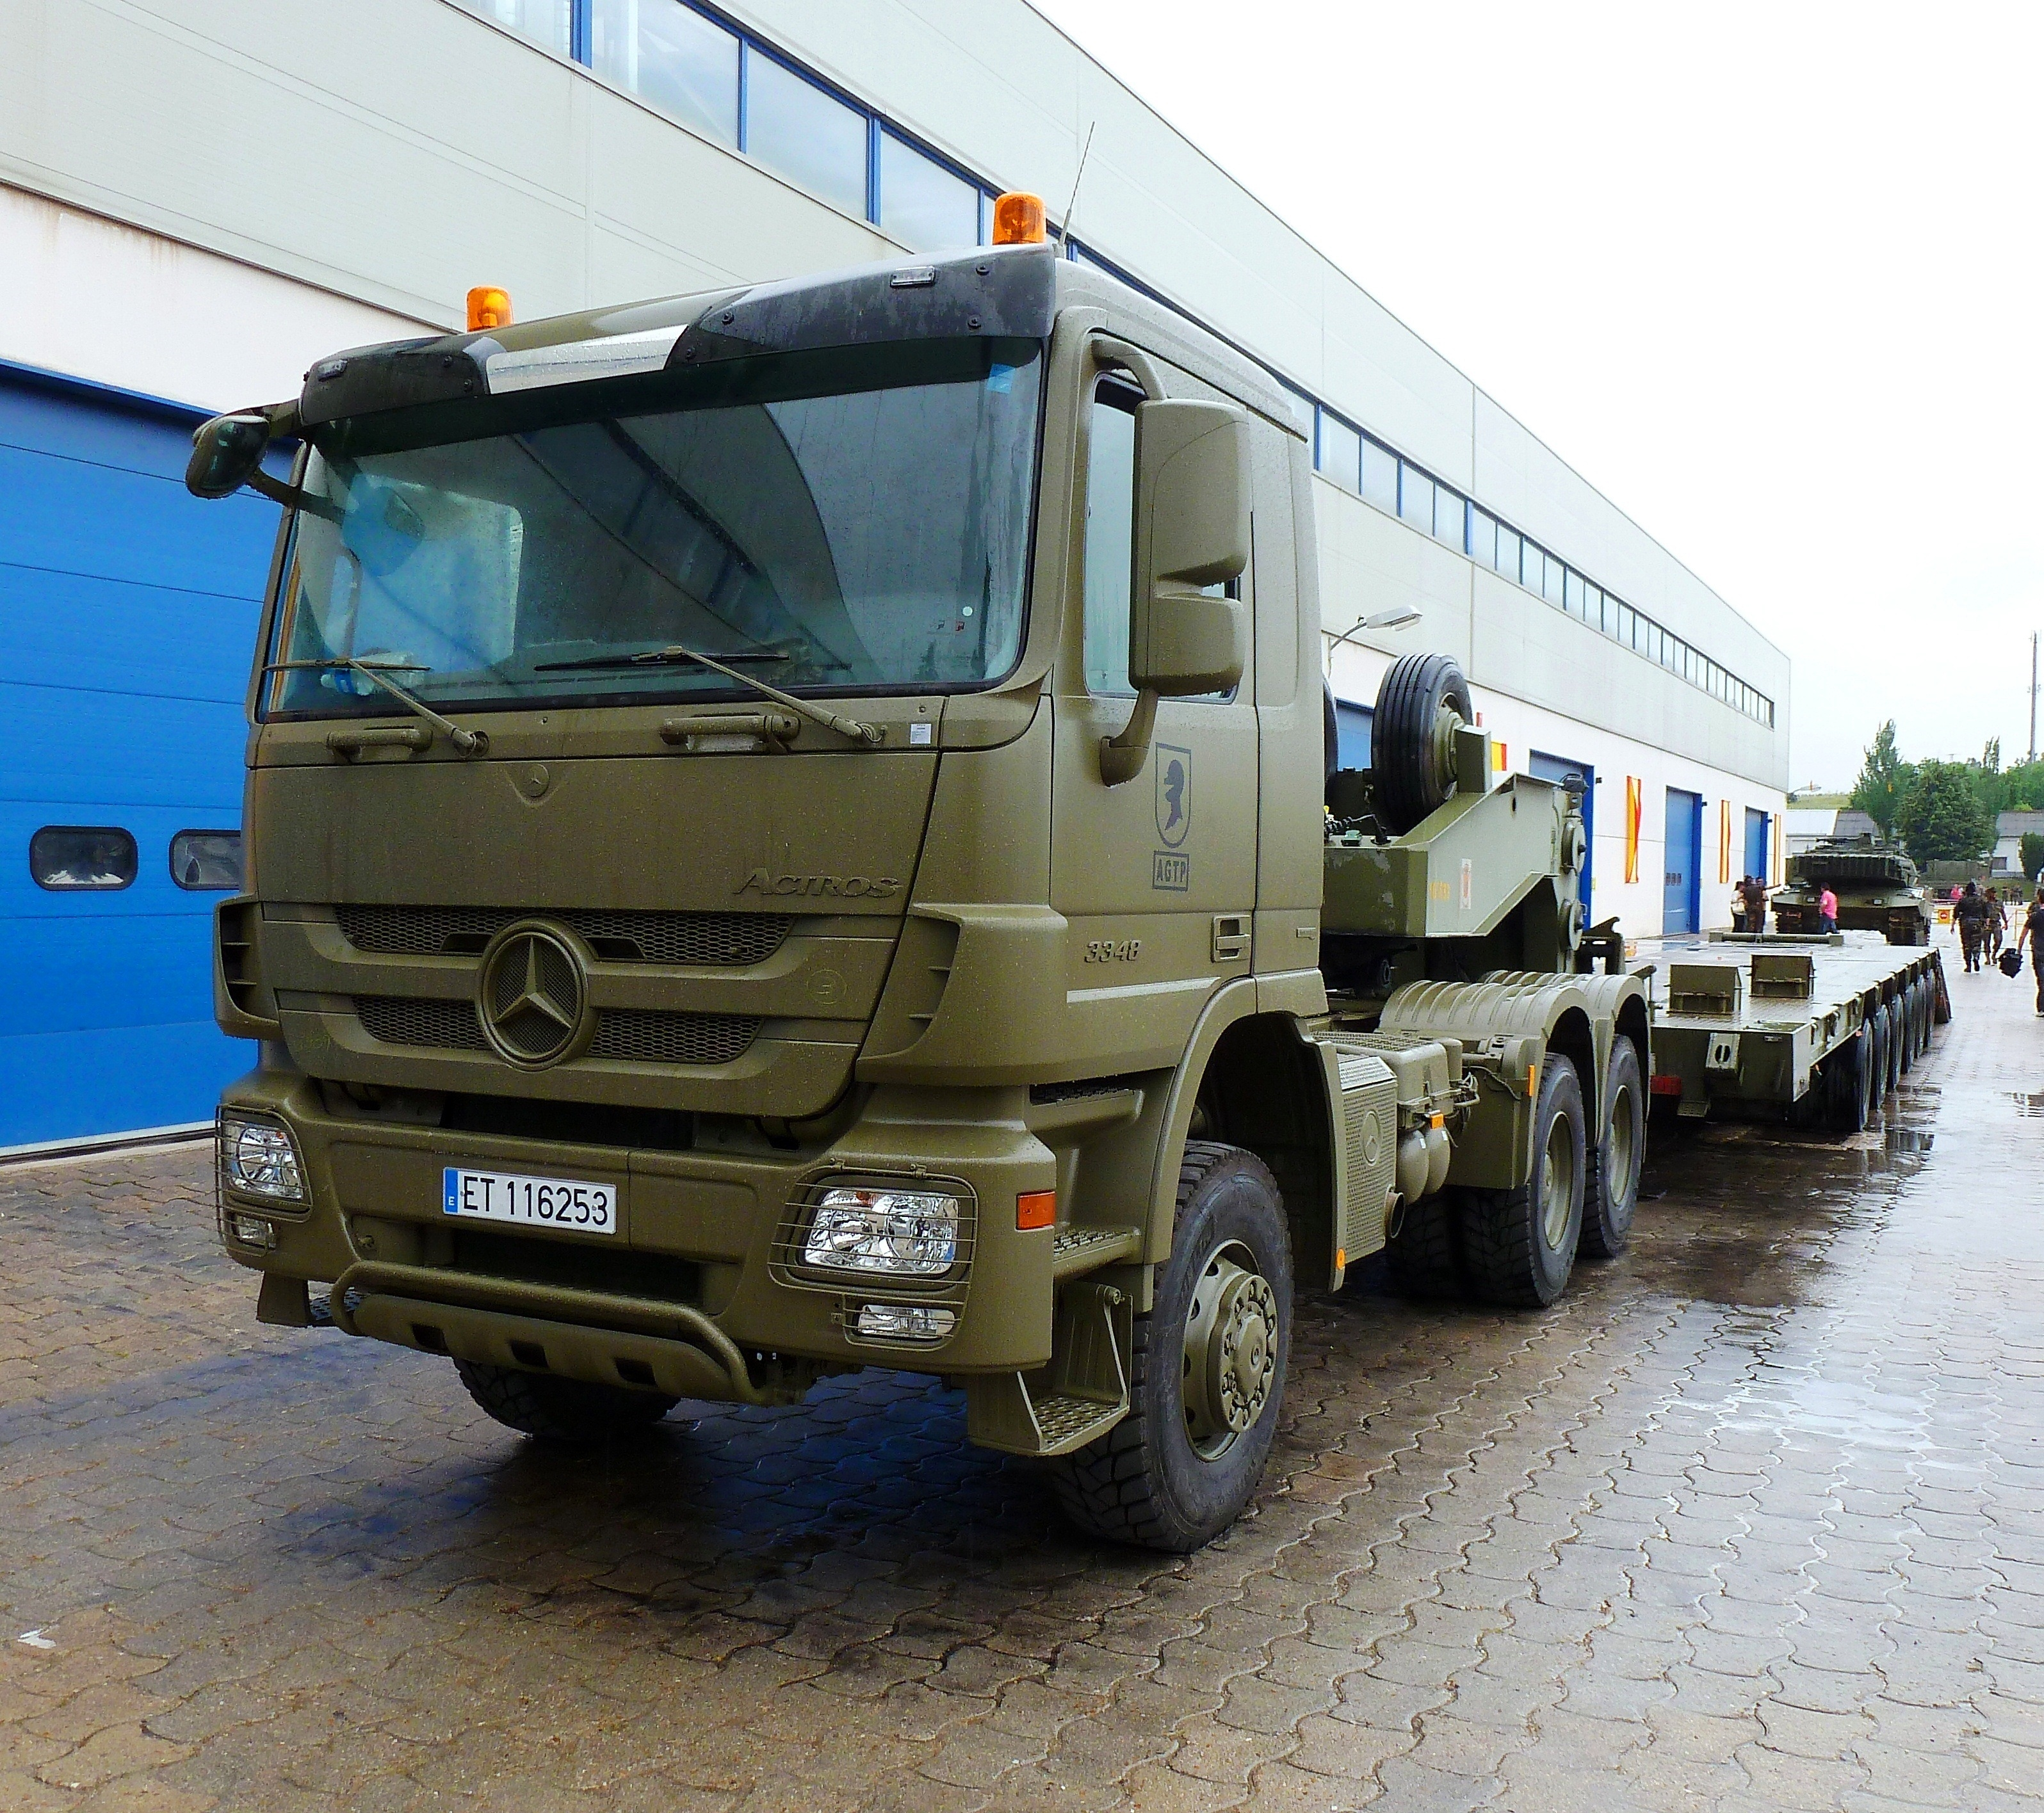 List Of Military Trucks